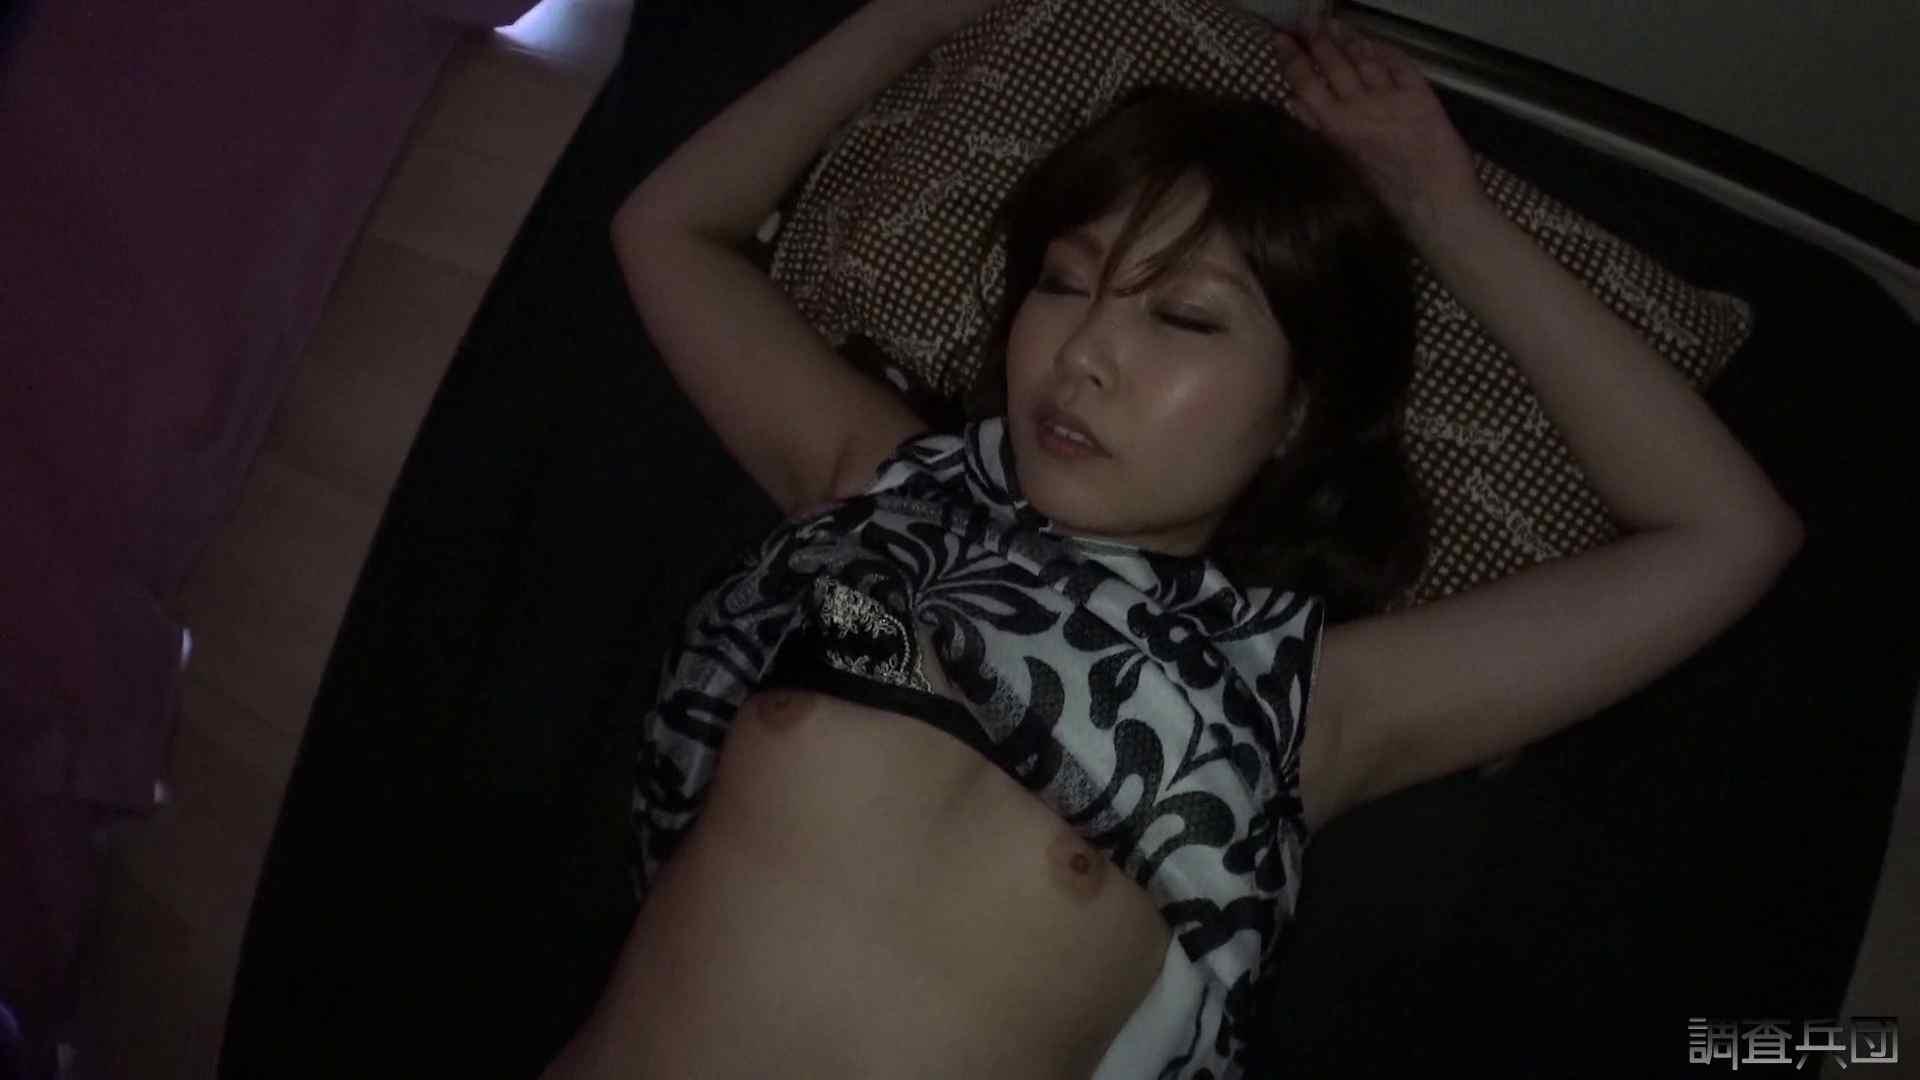 RE:~反撃の悪戯~vol.21 V系追っかけギャル・ナオコ【前編】 OL  111pic 86